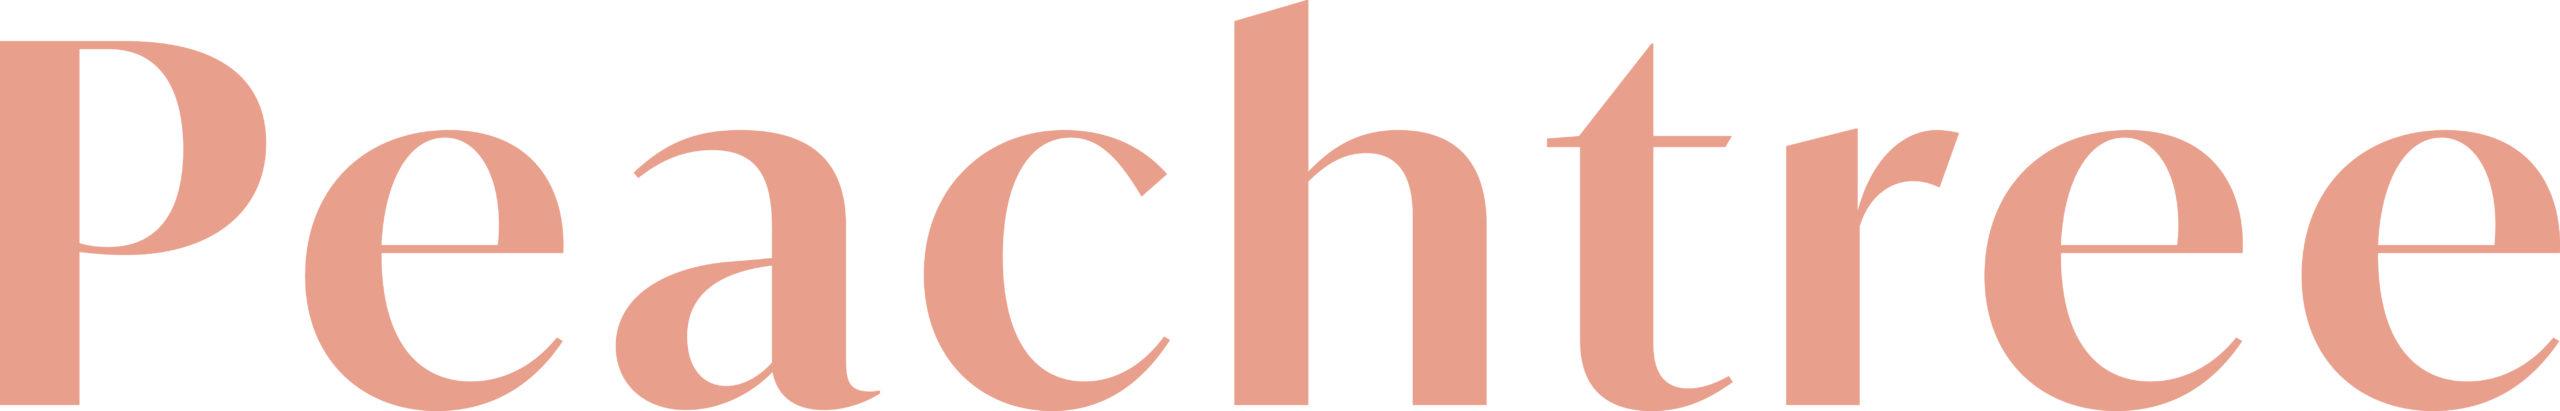 Peachtree Logo (Color)